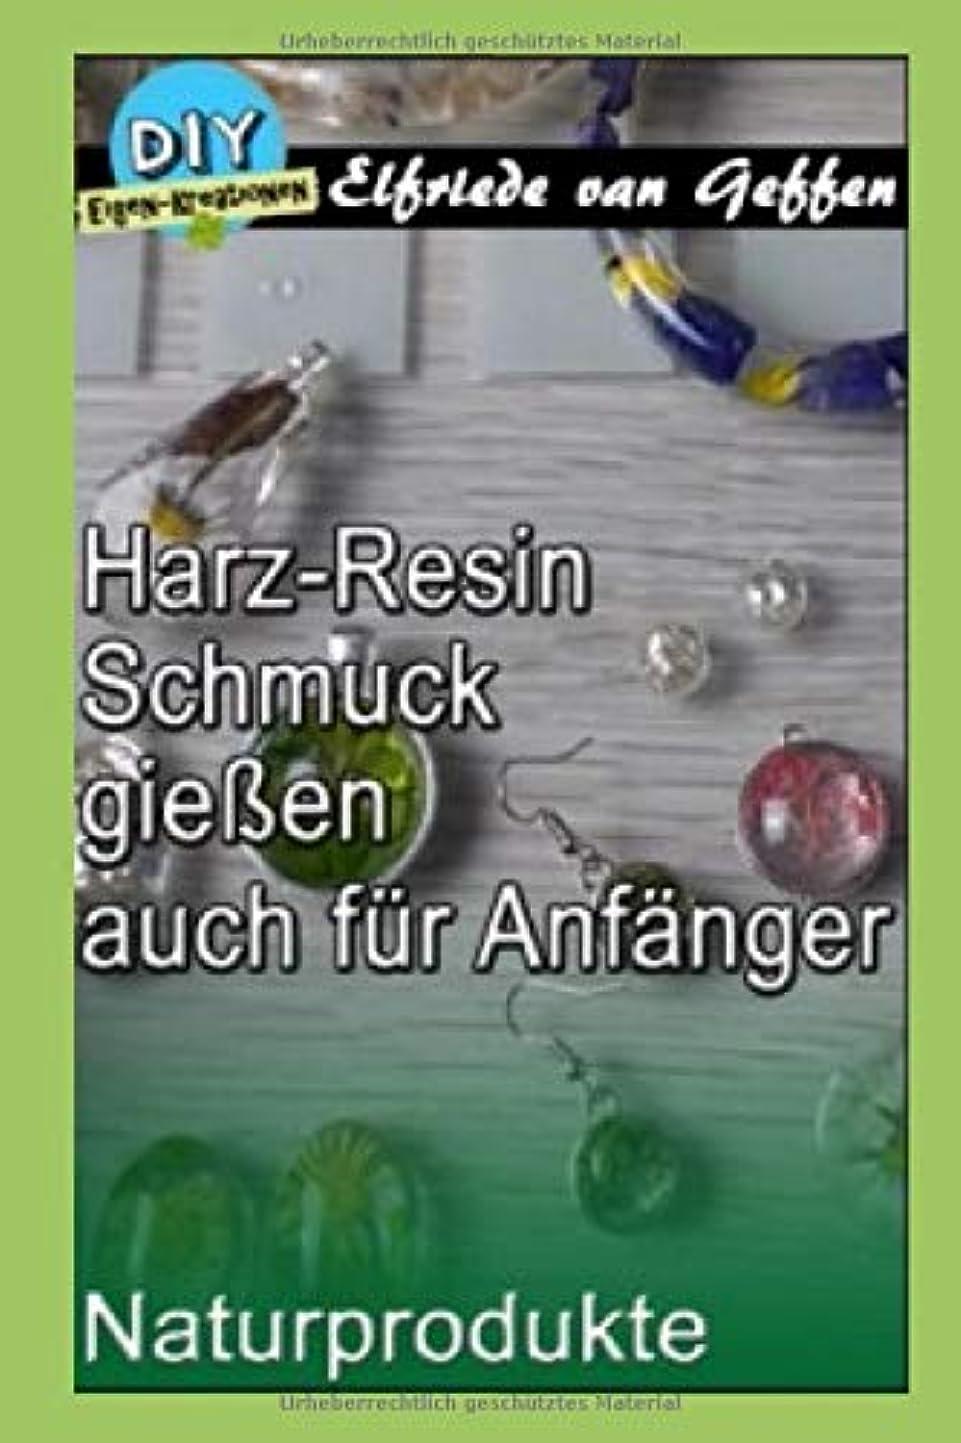 裁判所重要性若者Harz-Resin Schmuck giessen auch fuer Anfaenger: Glasklare Schmuckstuecke mit Naturprodukte (Schmuck-Deco gestalten)